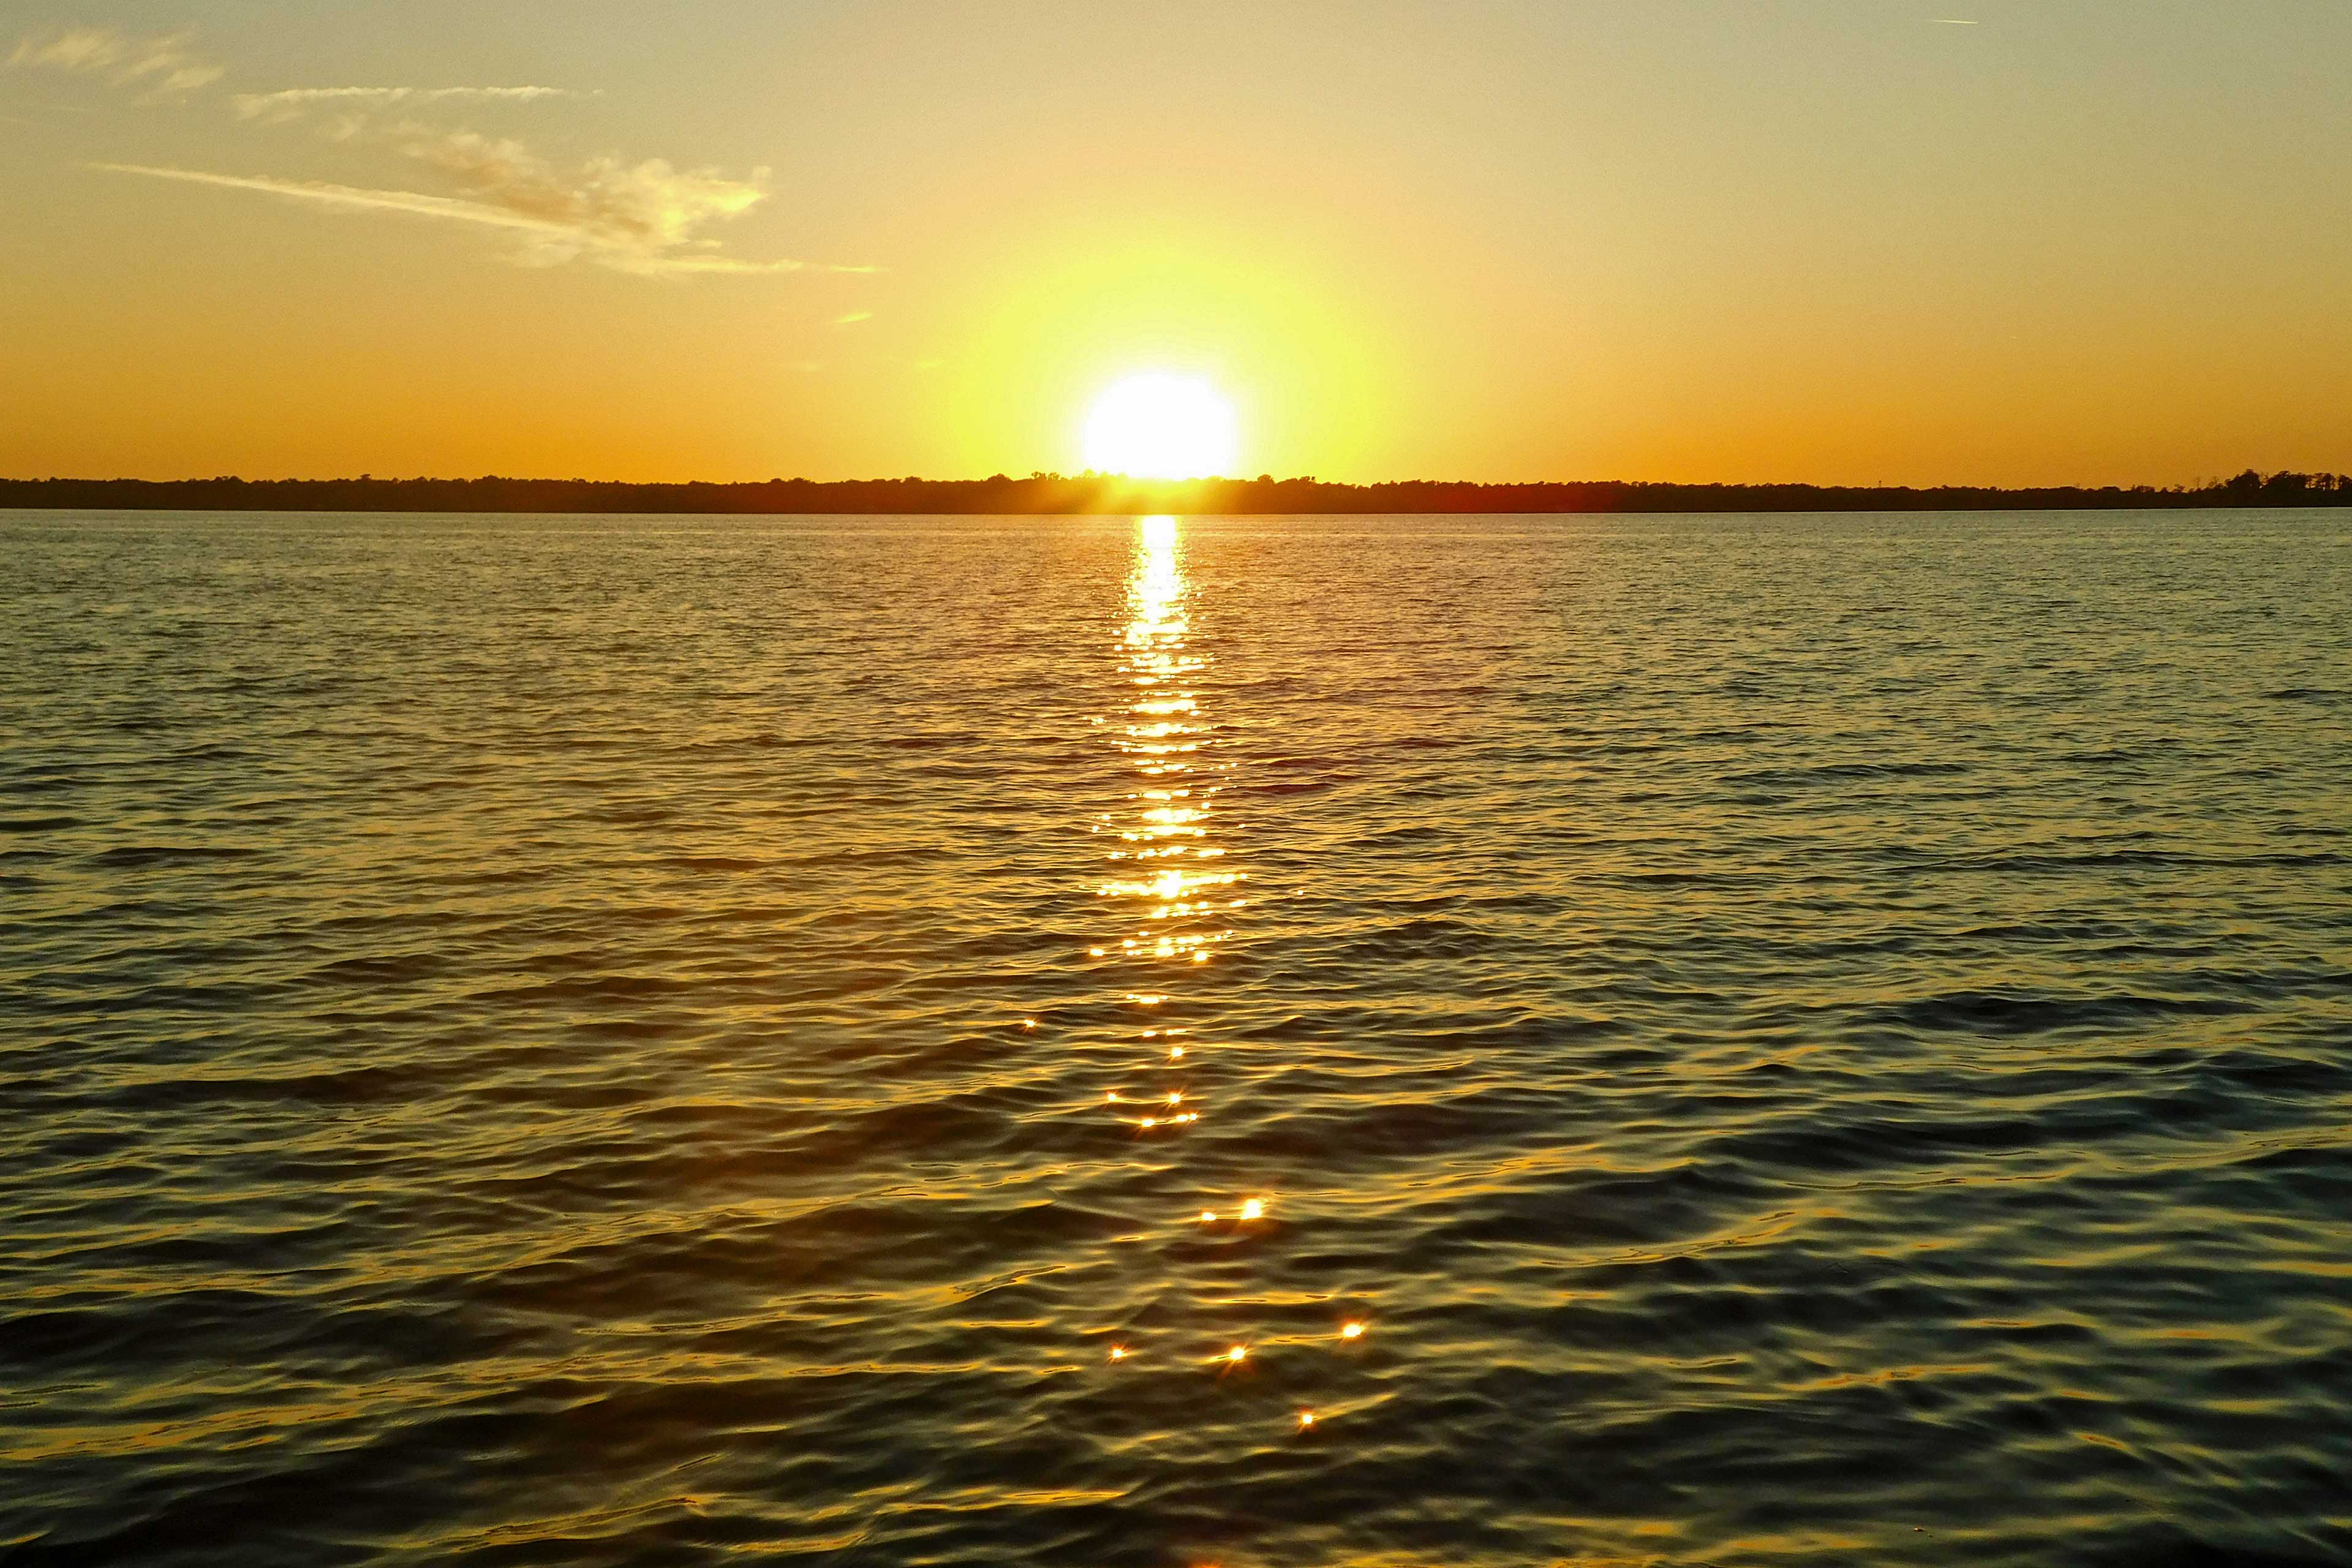 Soak in breathtaking sunset views!